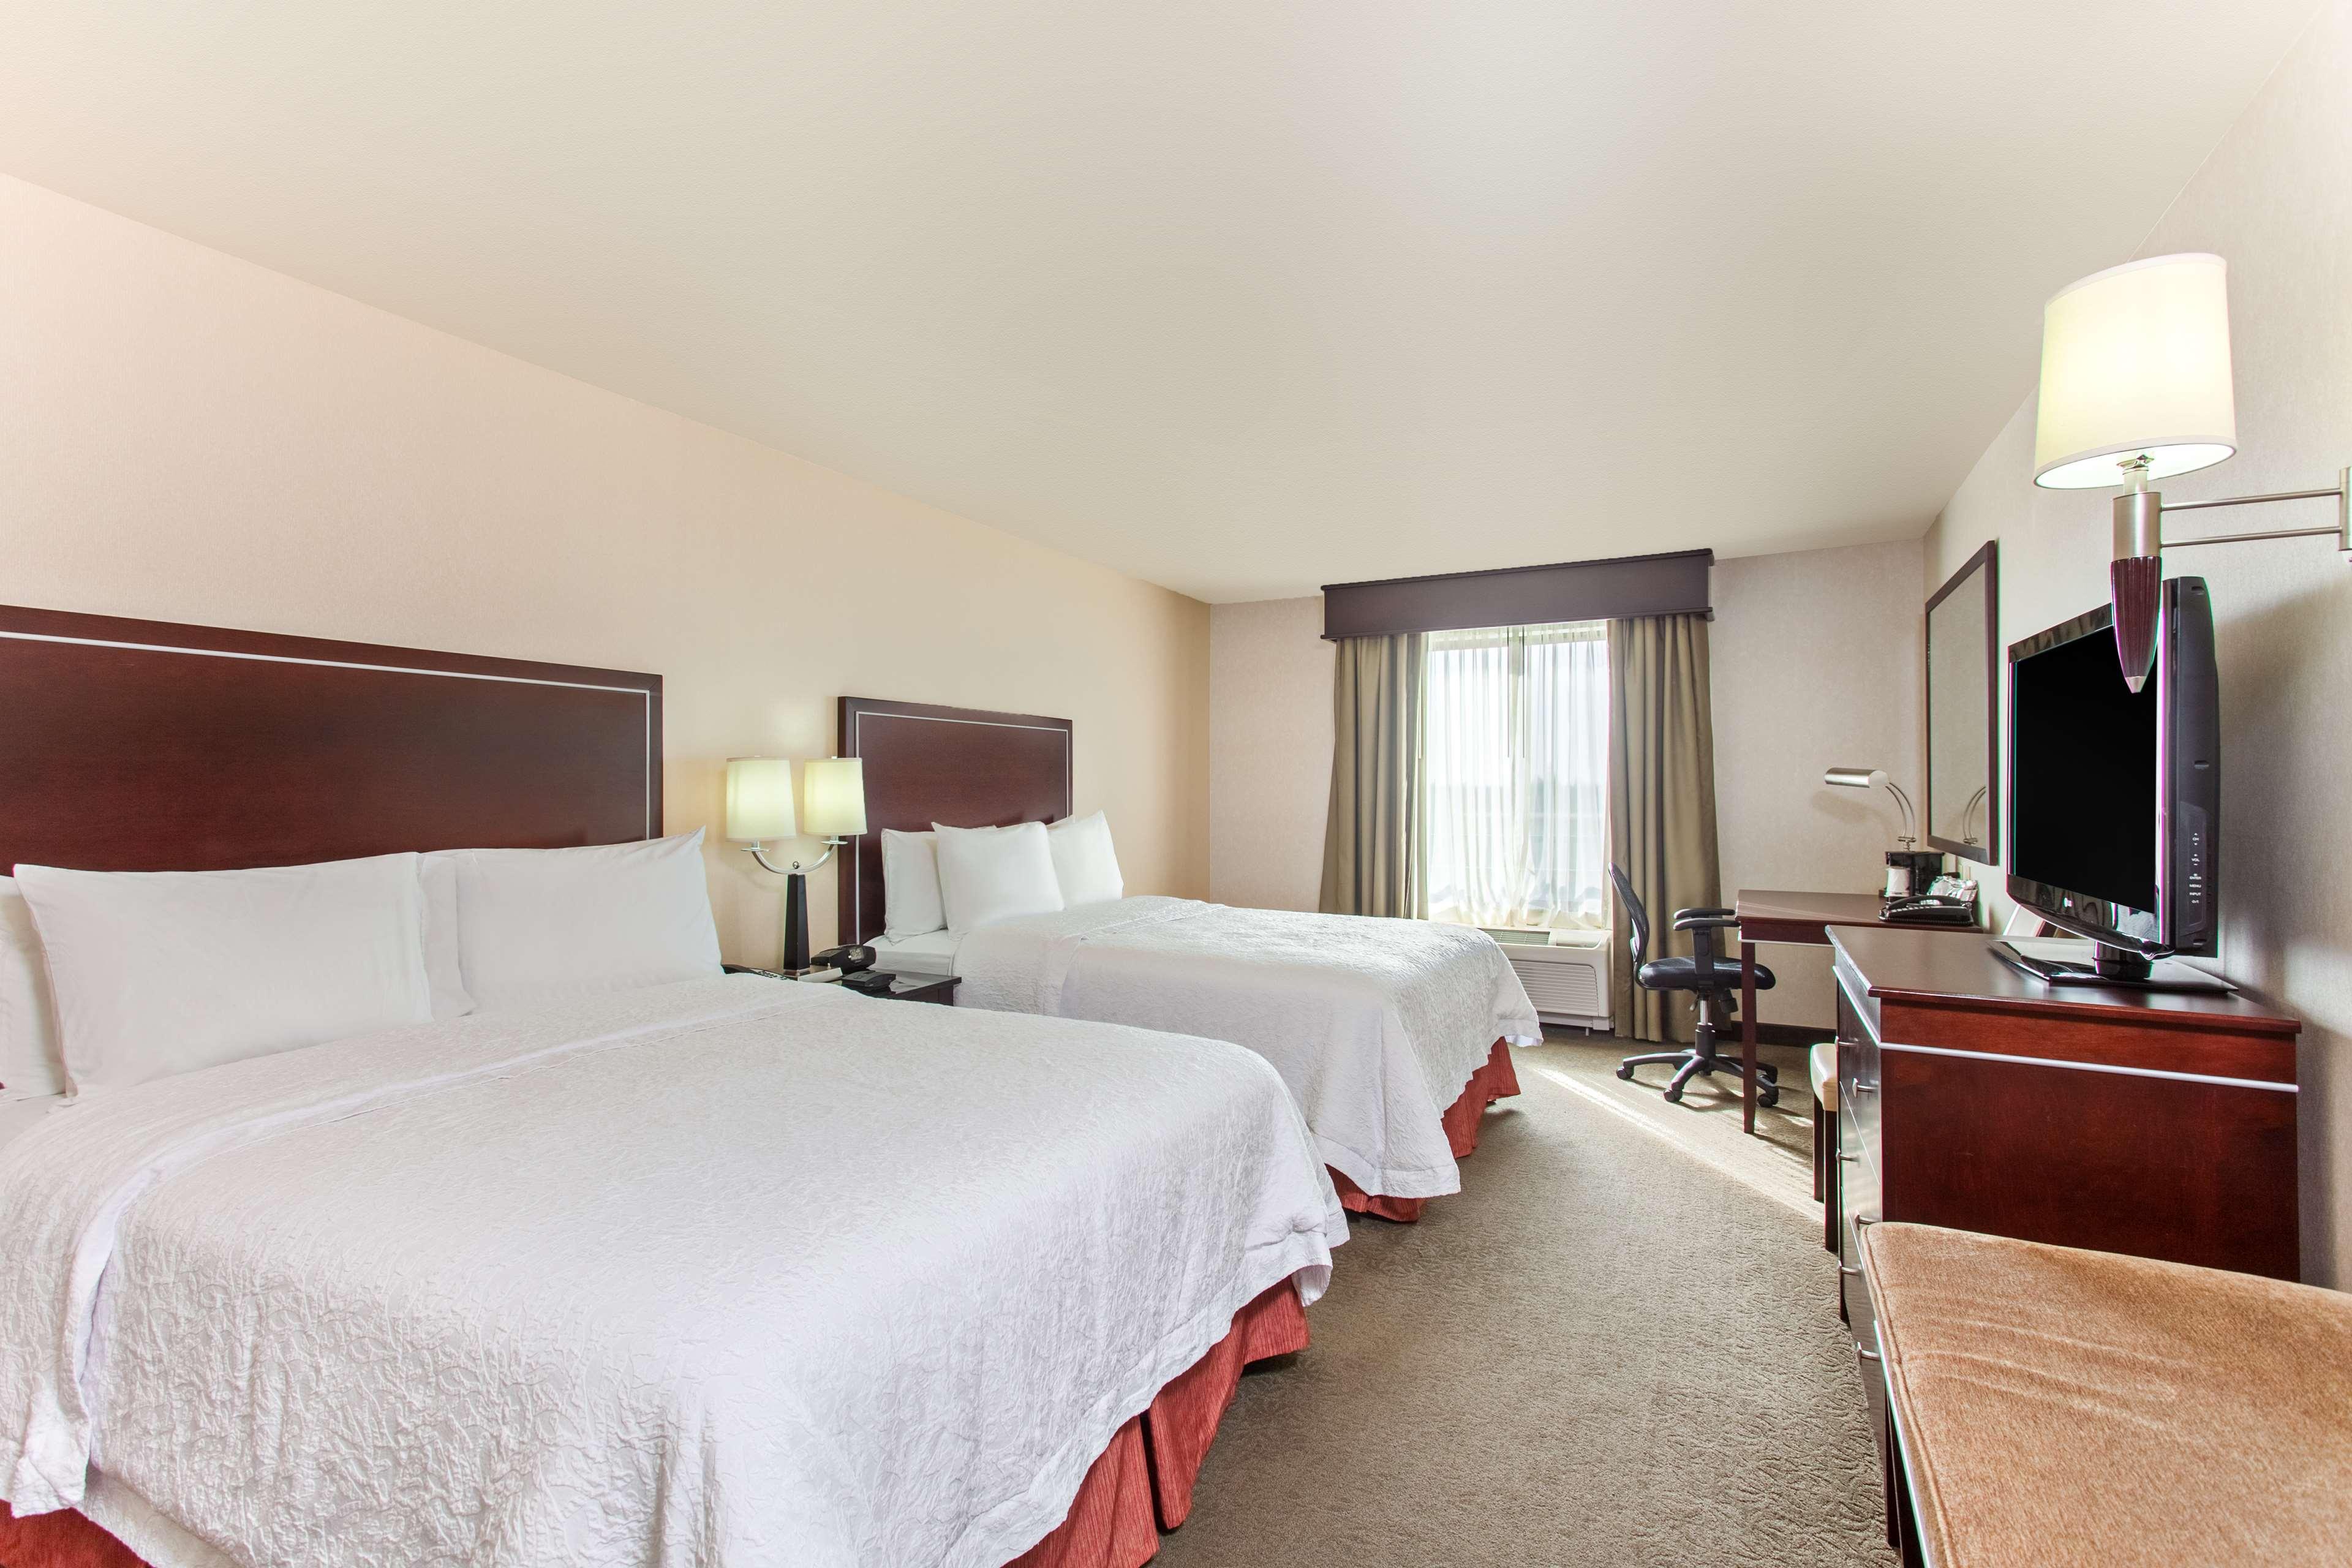 Hampton Inn & Suites Roseville image 8